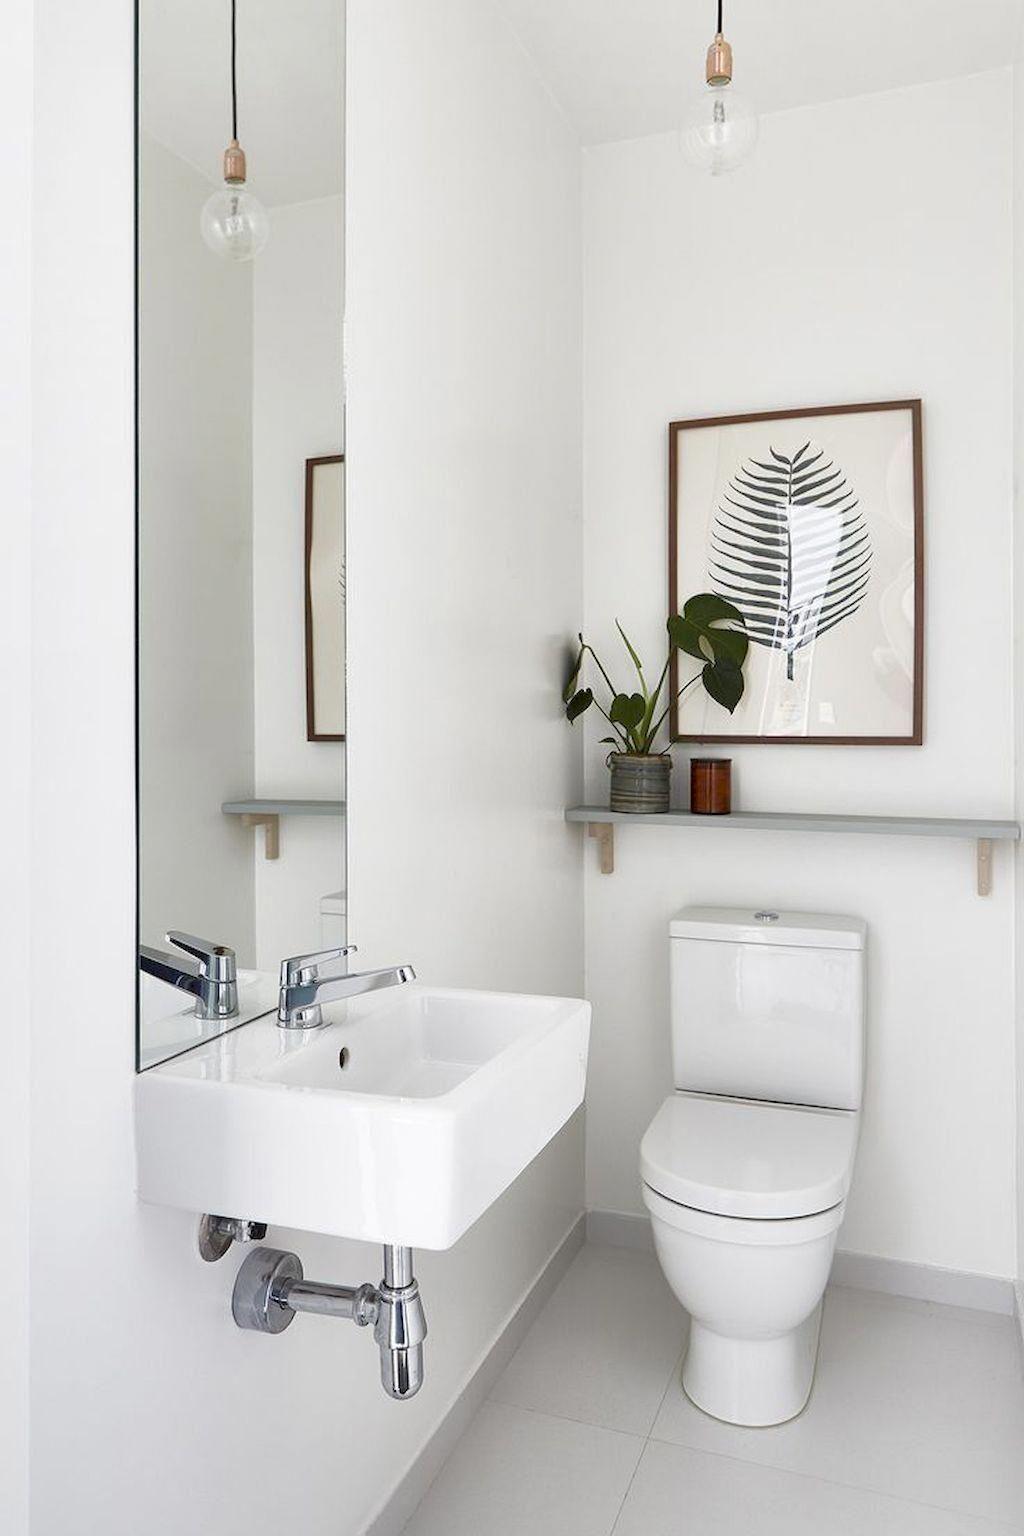 Bathroommakeover Small Toilet Room Half Bathroom Remodel Small Bathroom Remodel